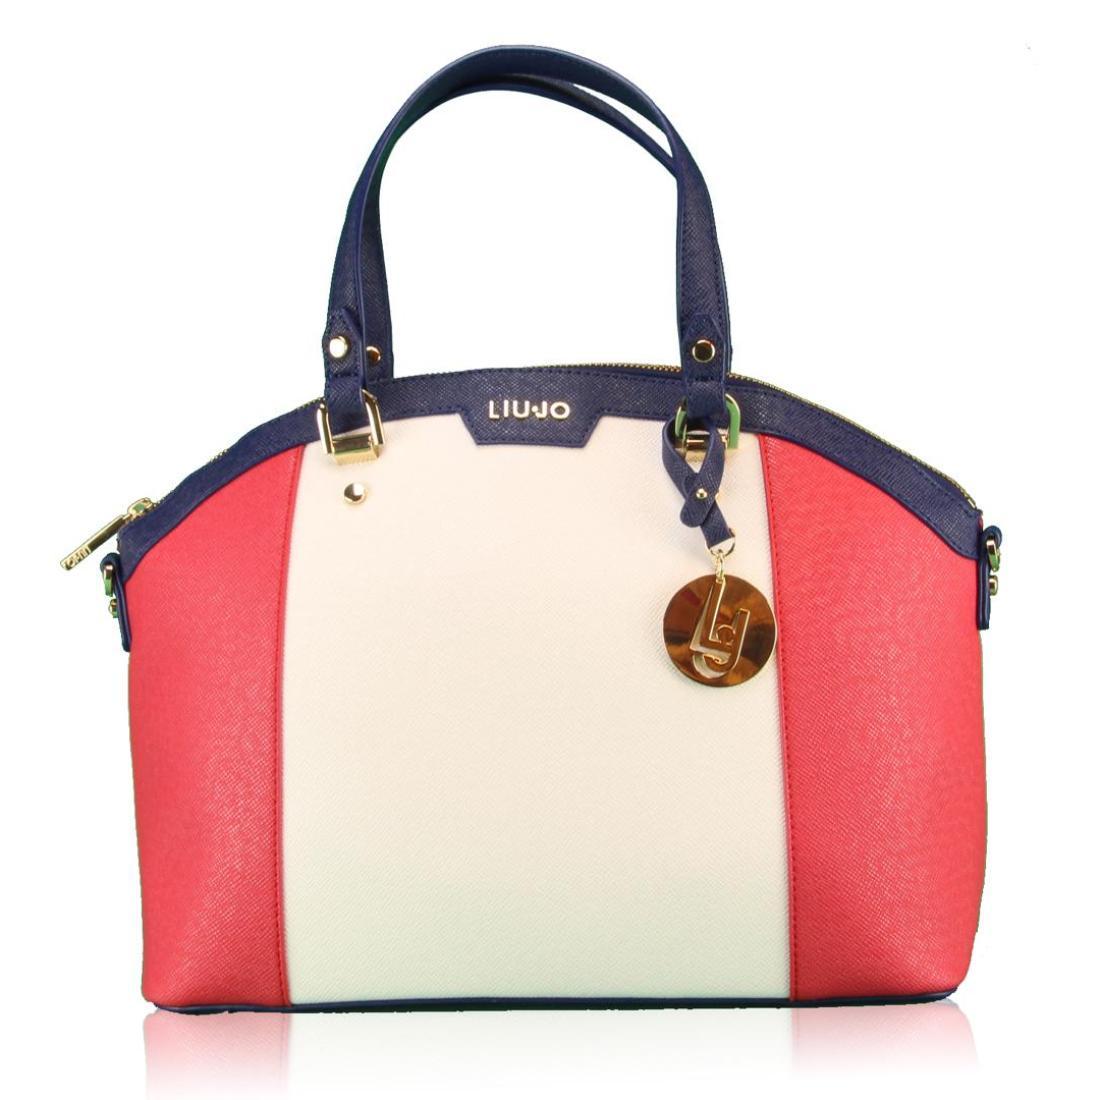 LIUJO Borsa Shopping M CANNES N16246 E0087 RossoBiancoBlu